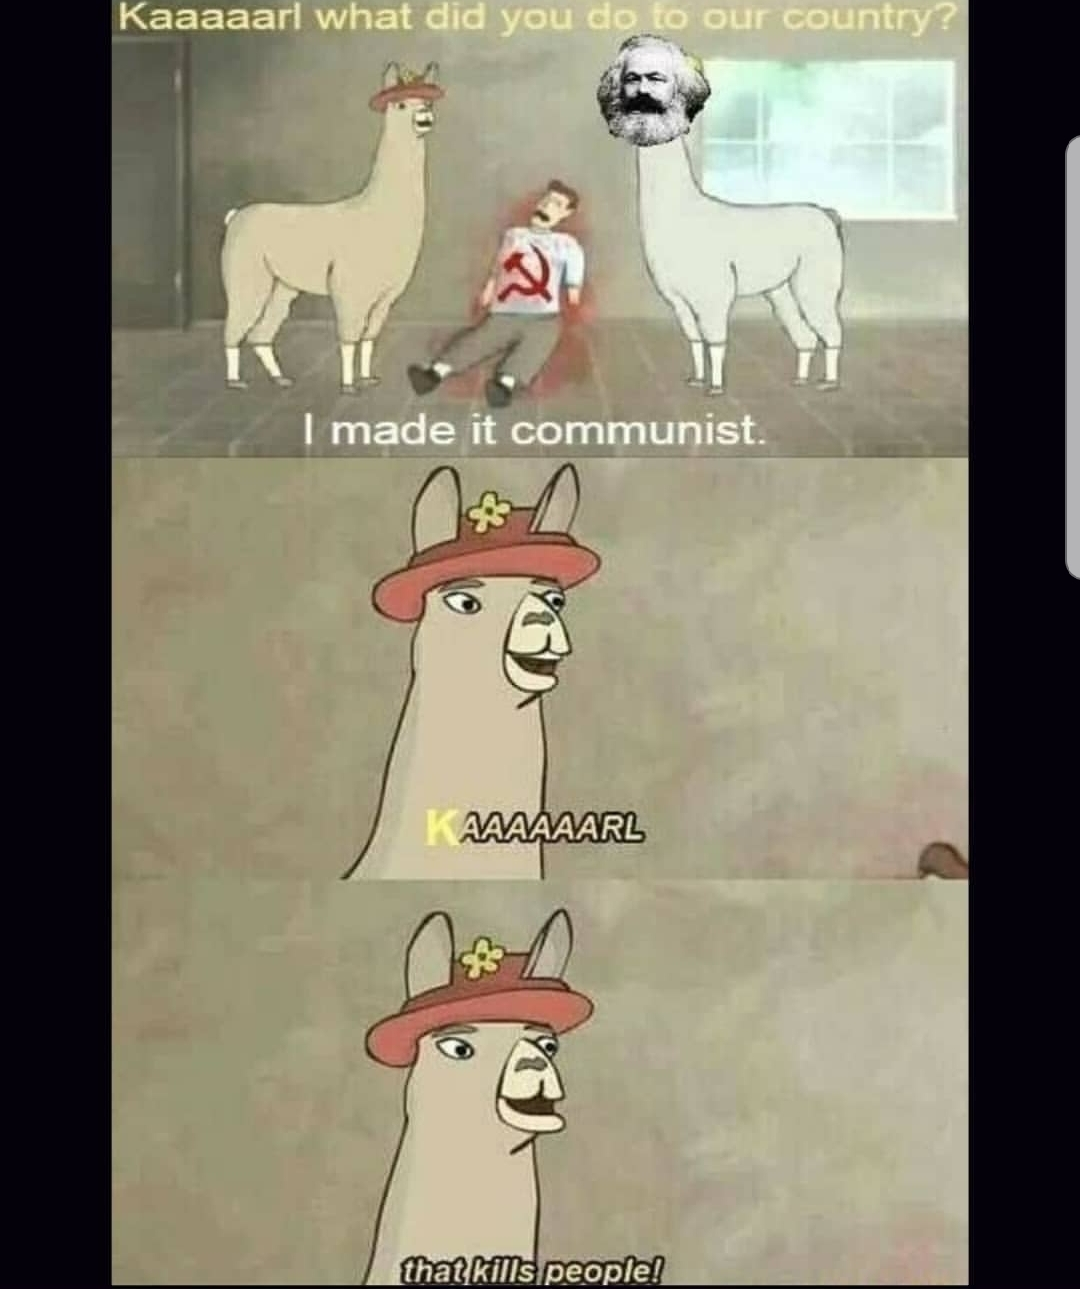 Classic meme re-imagined for ZA